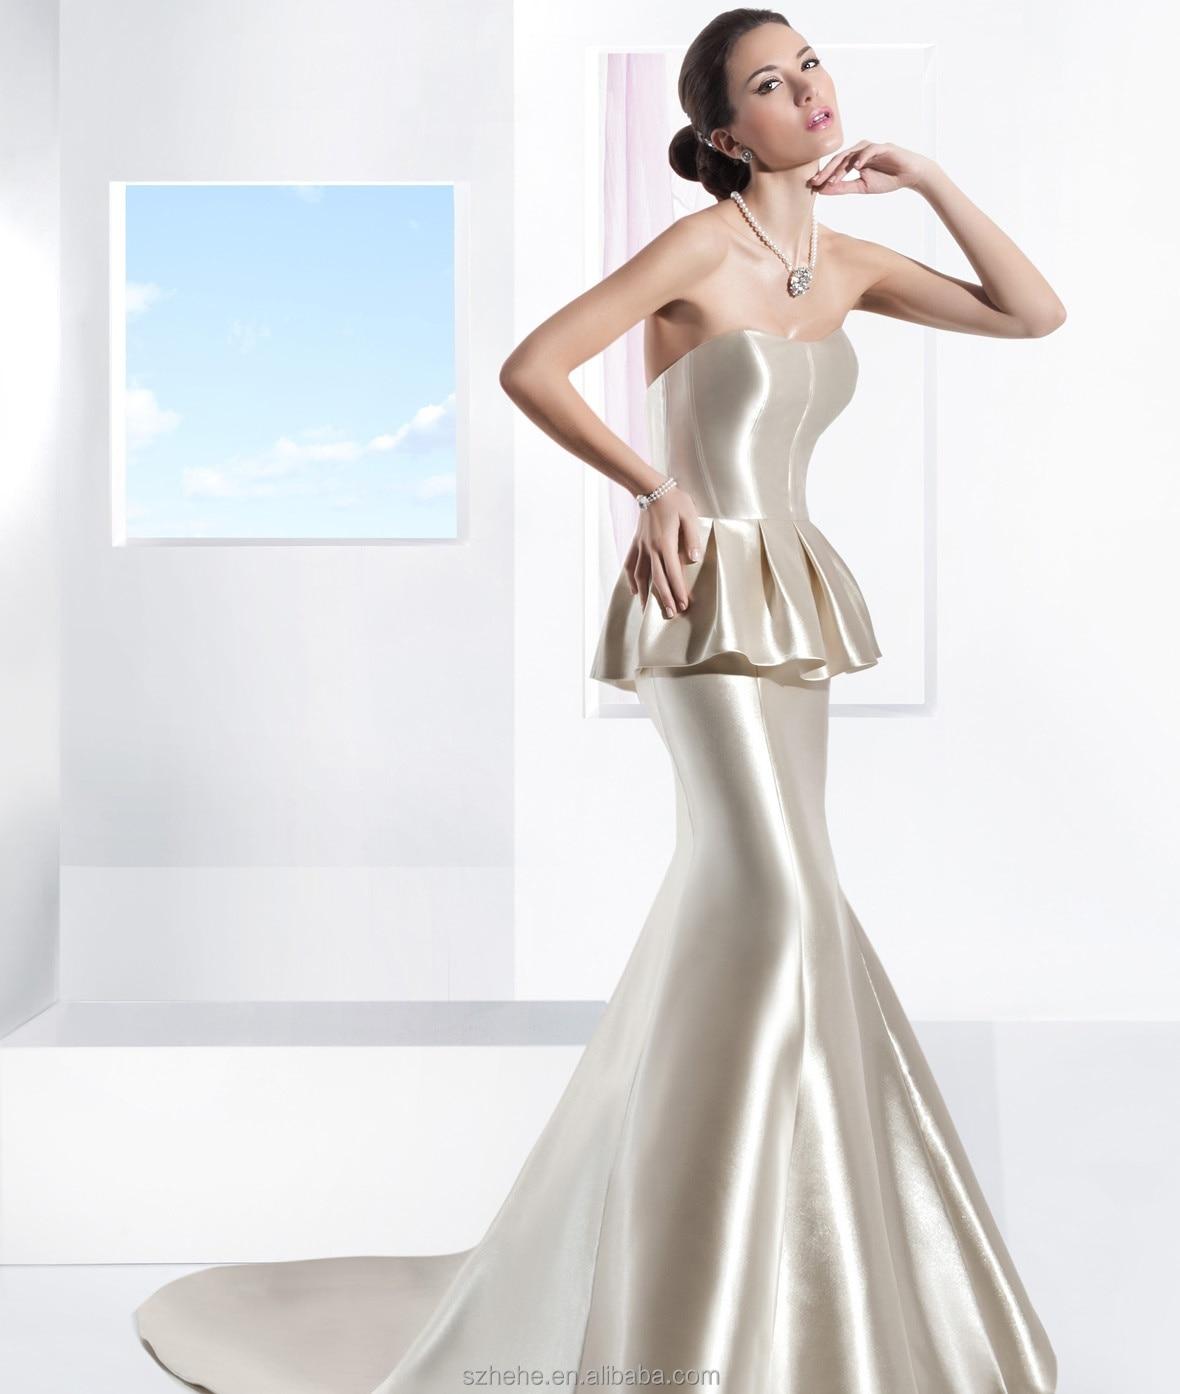 Elegant CW2453 with beaded belt peplum simple mermaid wedding dress ...